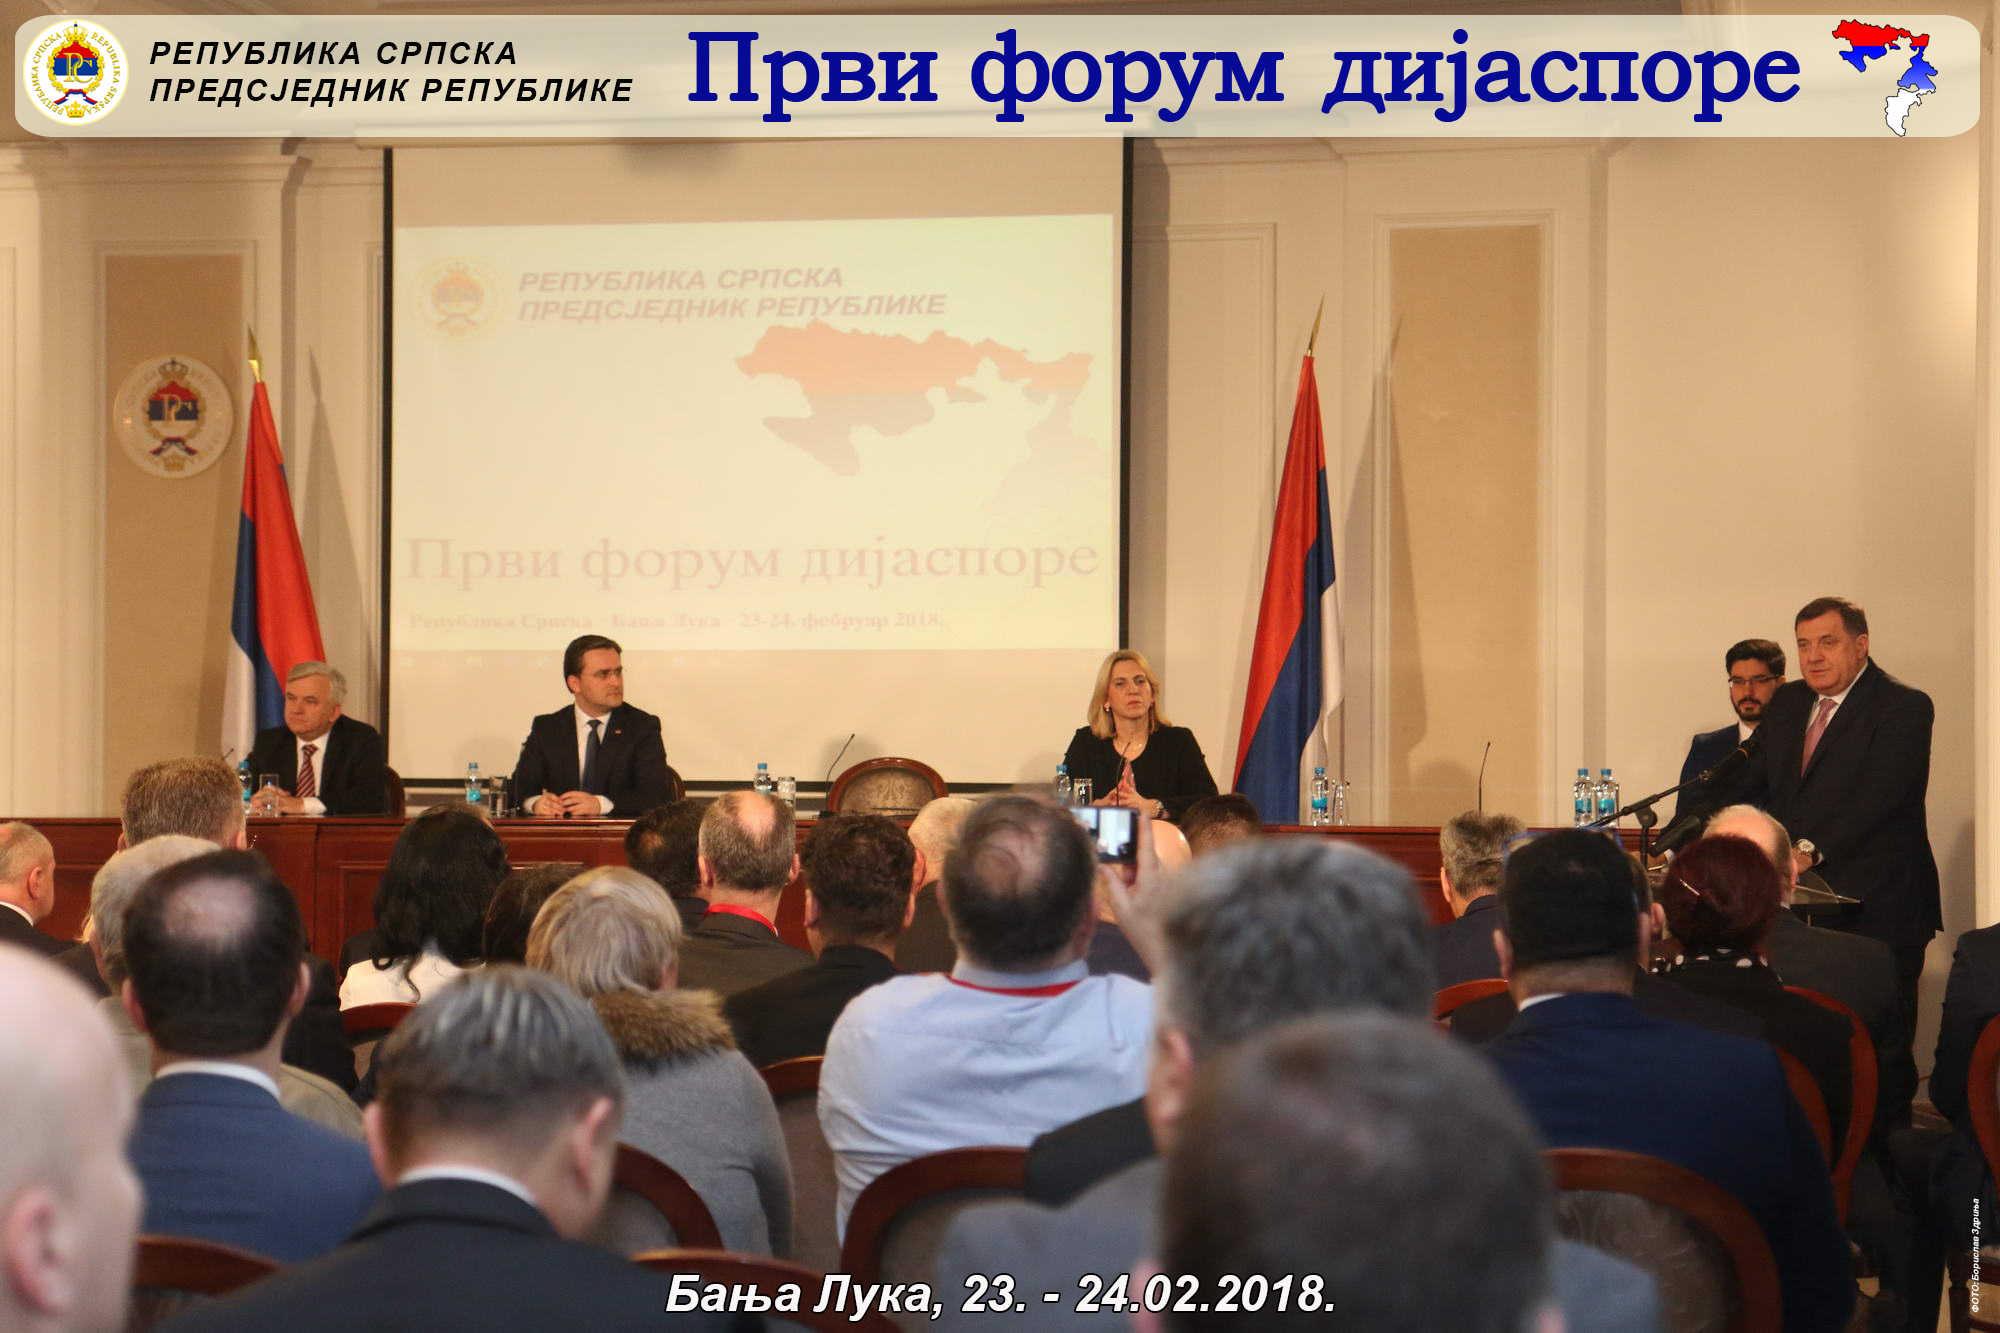 2018-02-23-i-24_prvi-forum-dijaspore_125_zipaphoto_borislav-zdrinja